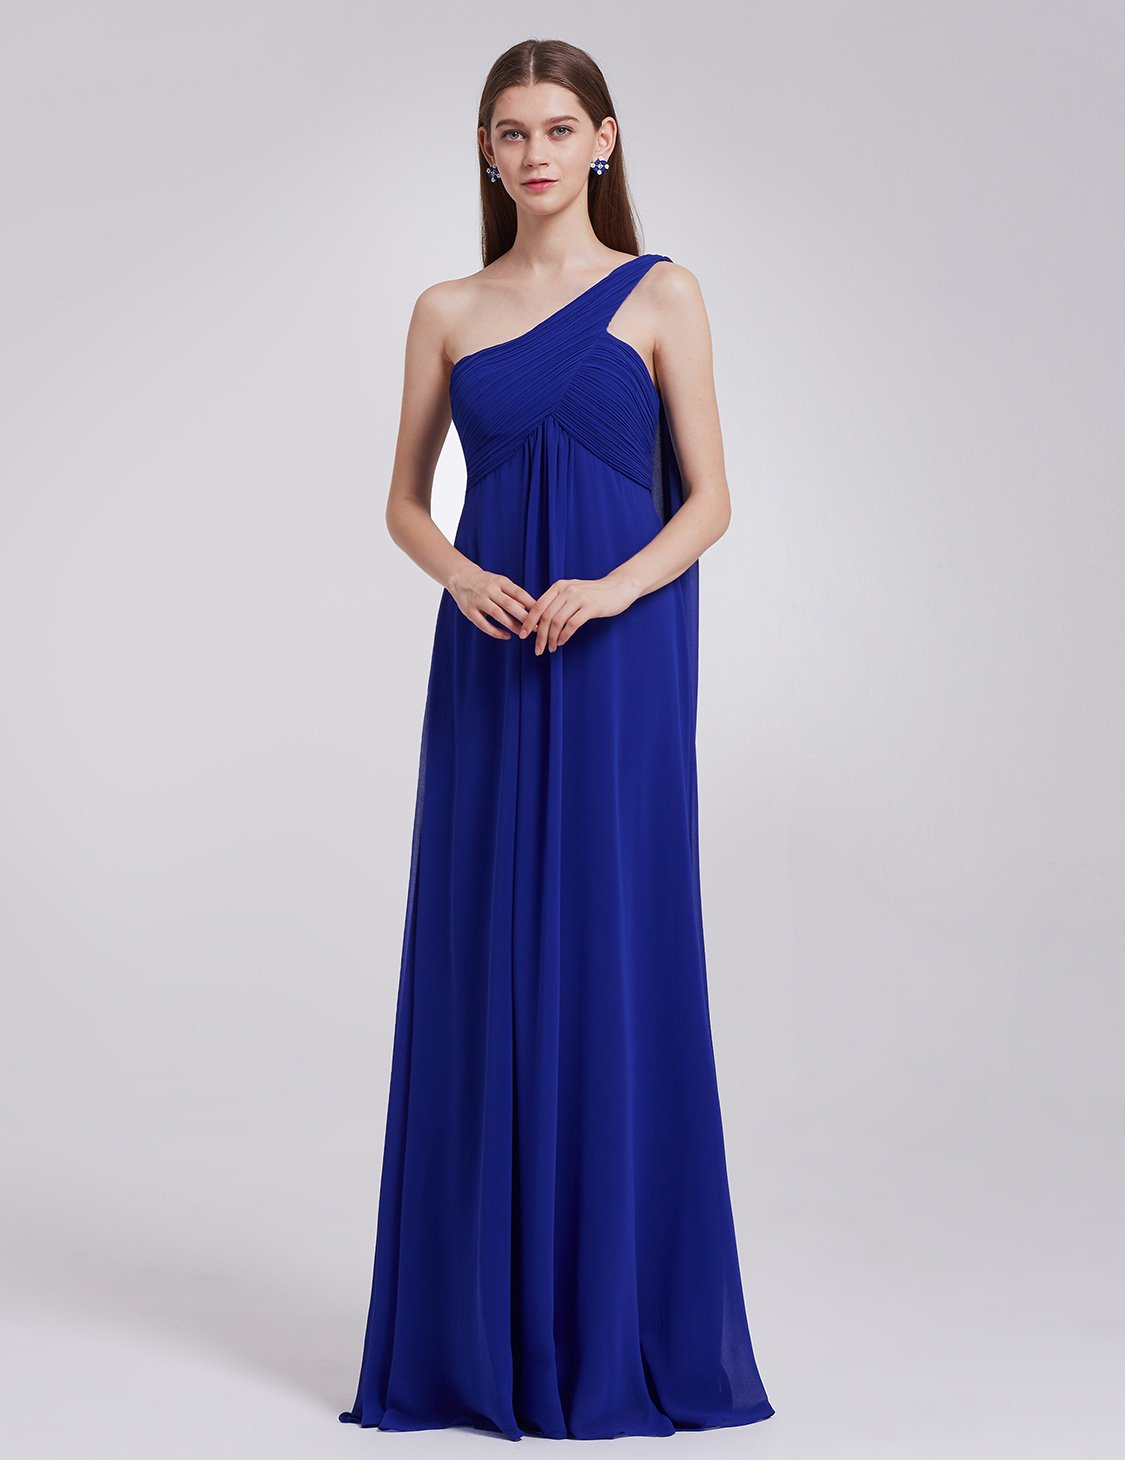 Ever-Pretty Womens Elegant One Shoulder Trailing Evening Dress 14 US Sapphire Blue